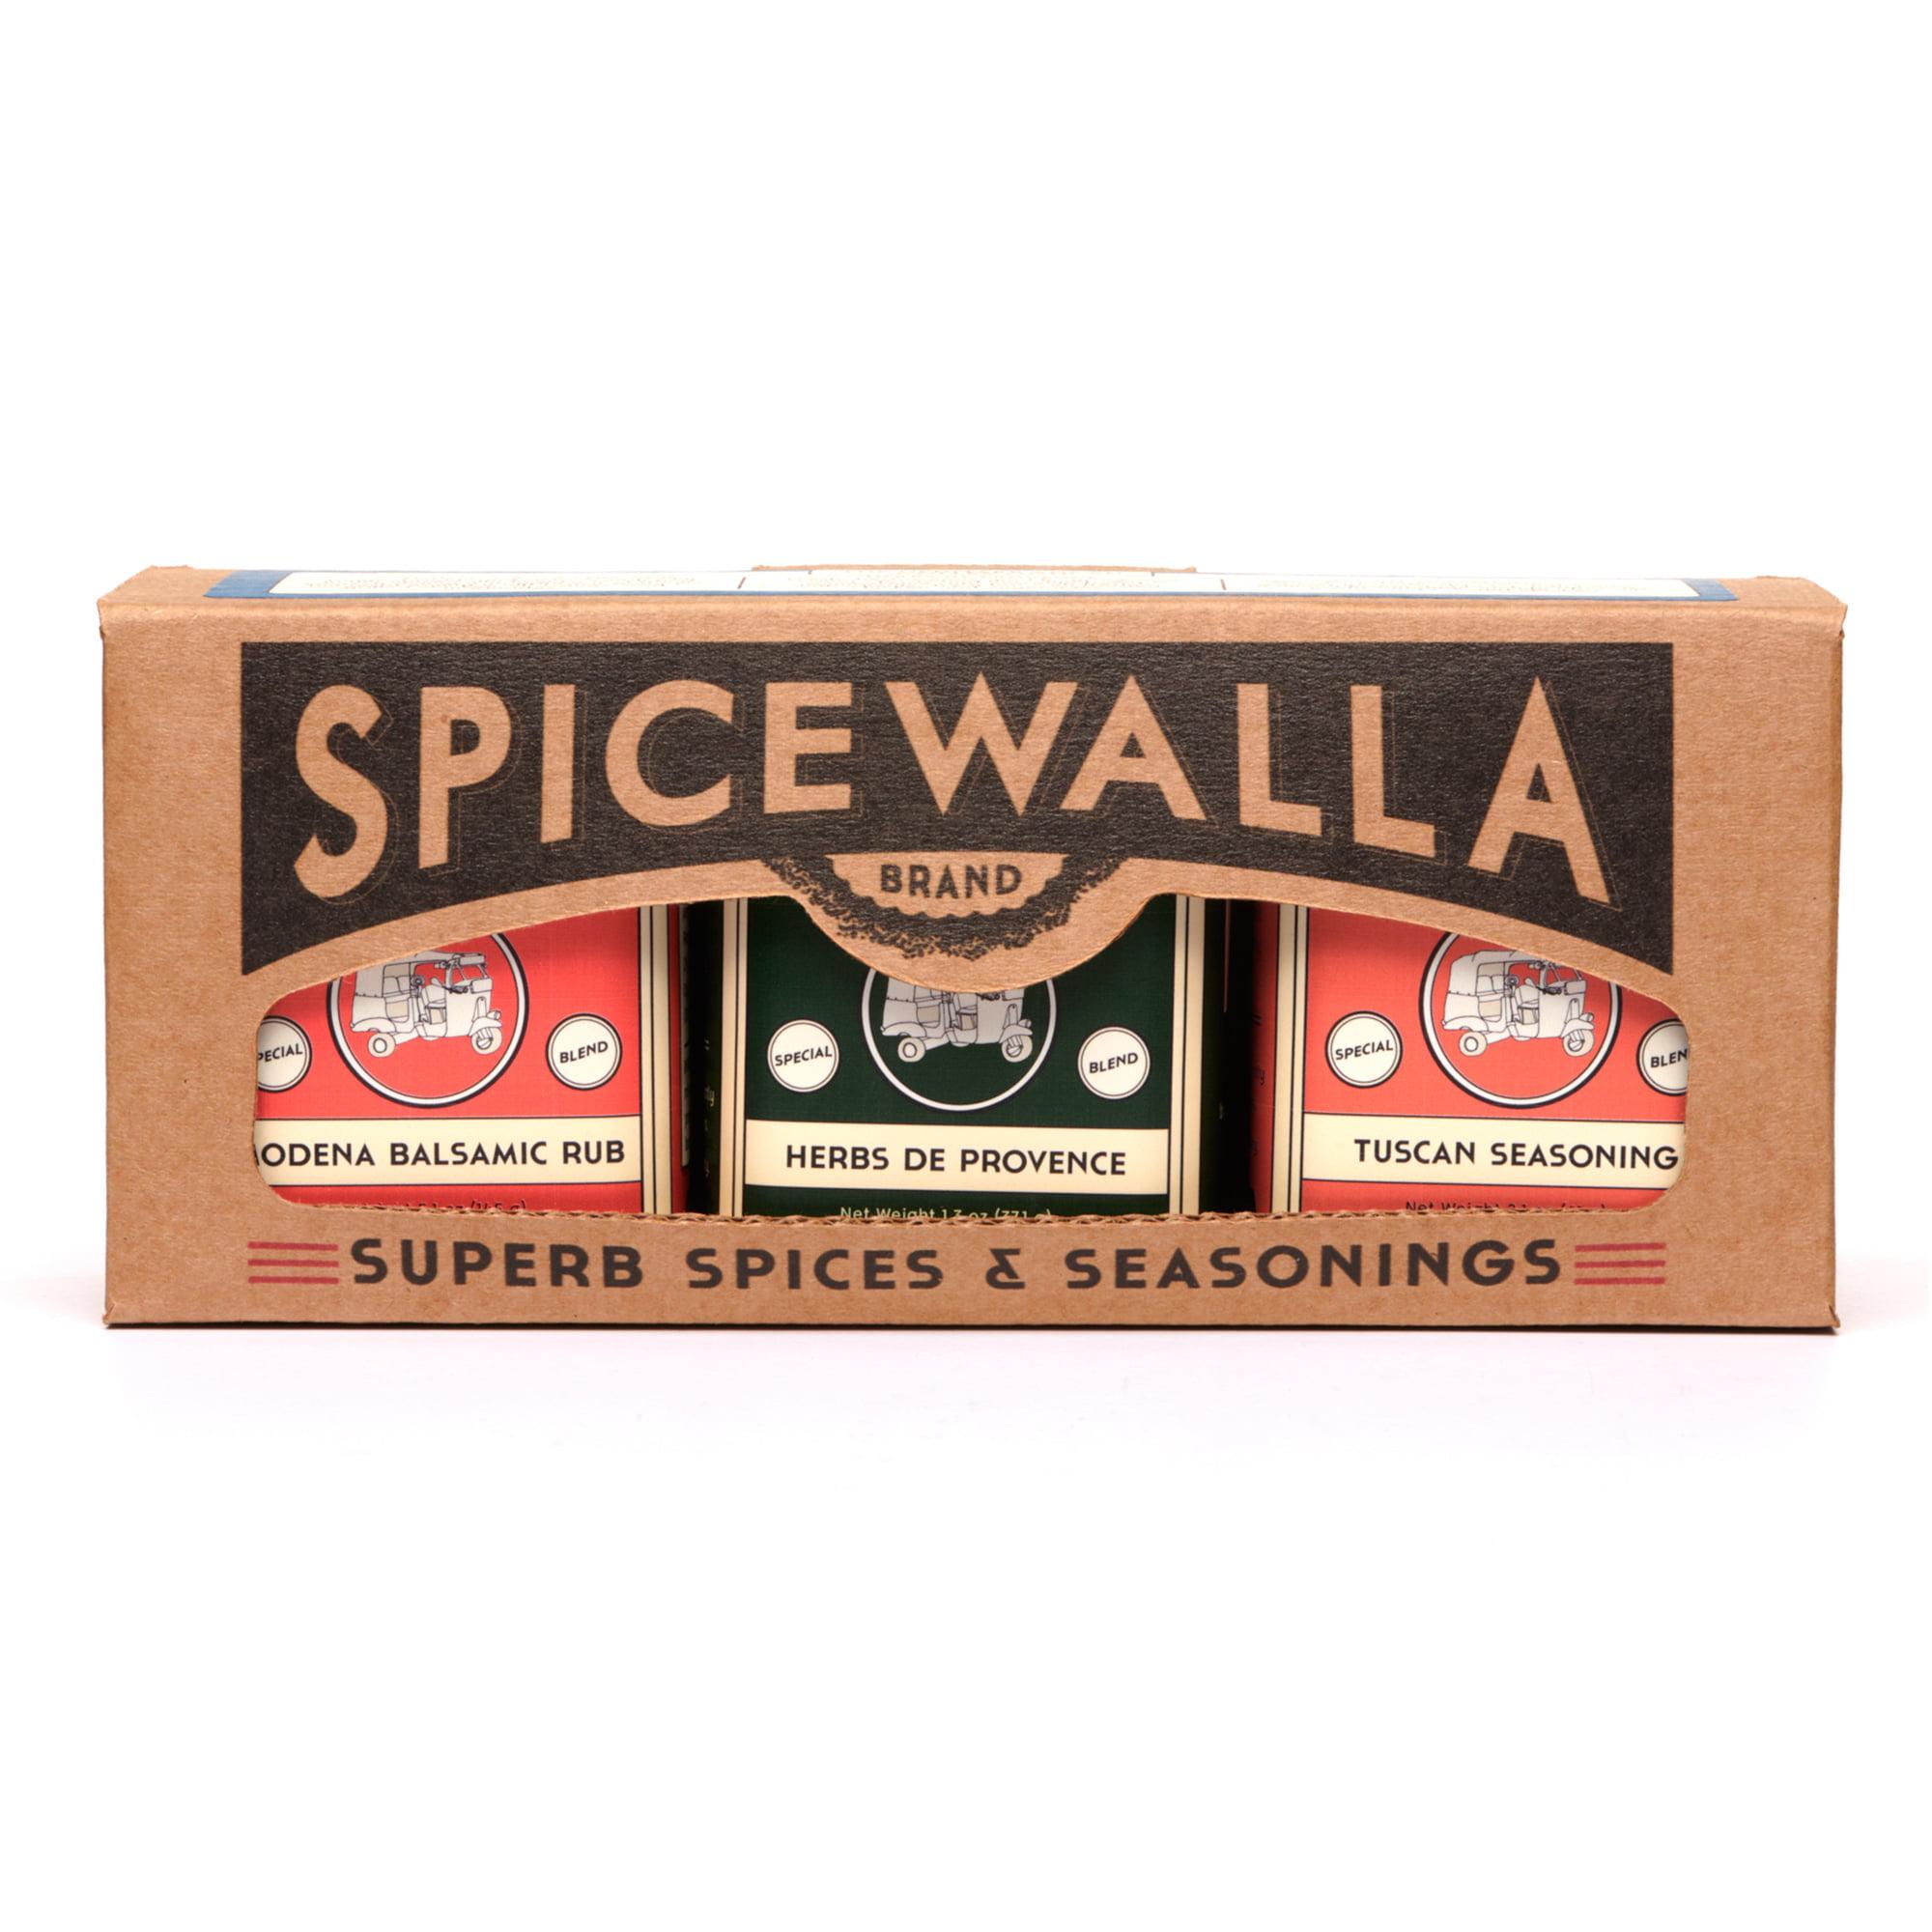 Spicewalla Mediterranean Spices 3 Pack 7 Oz Collection Tuscan Seasoning Herbs De Provence Modena Balsamic Rub Spice Seasonings And Blends Walmart Com